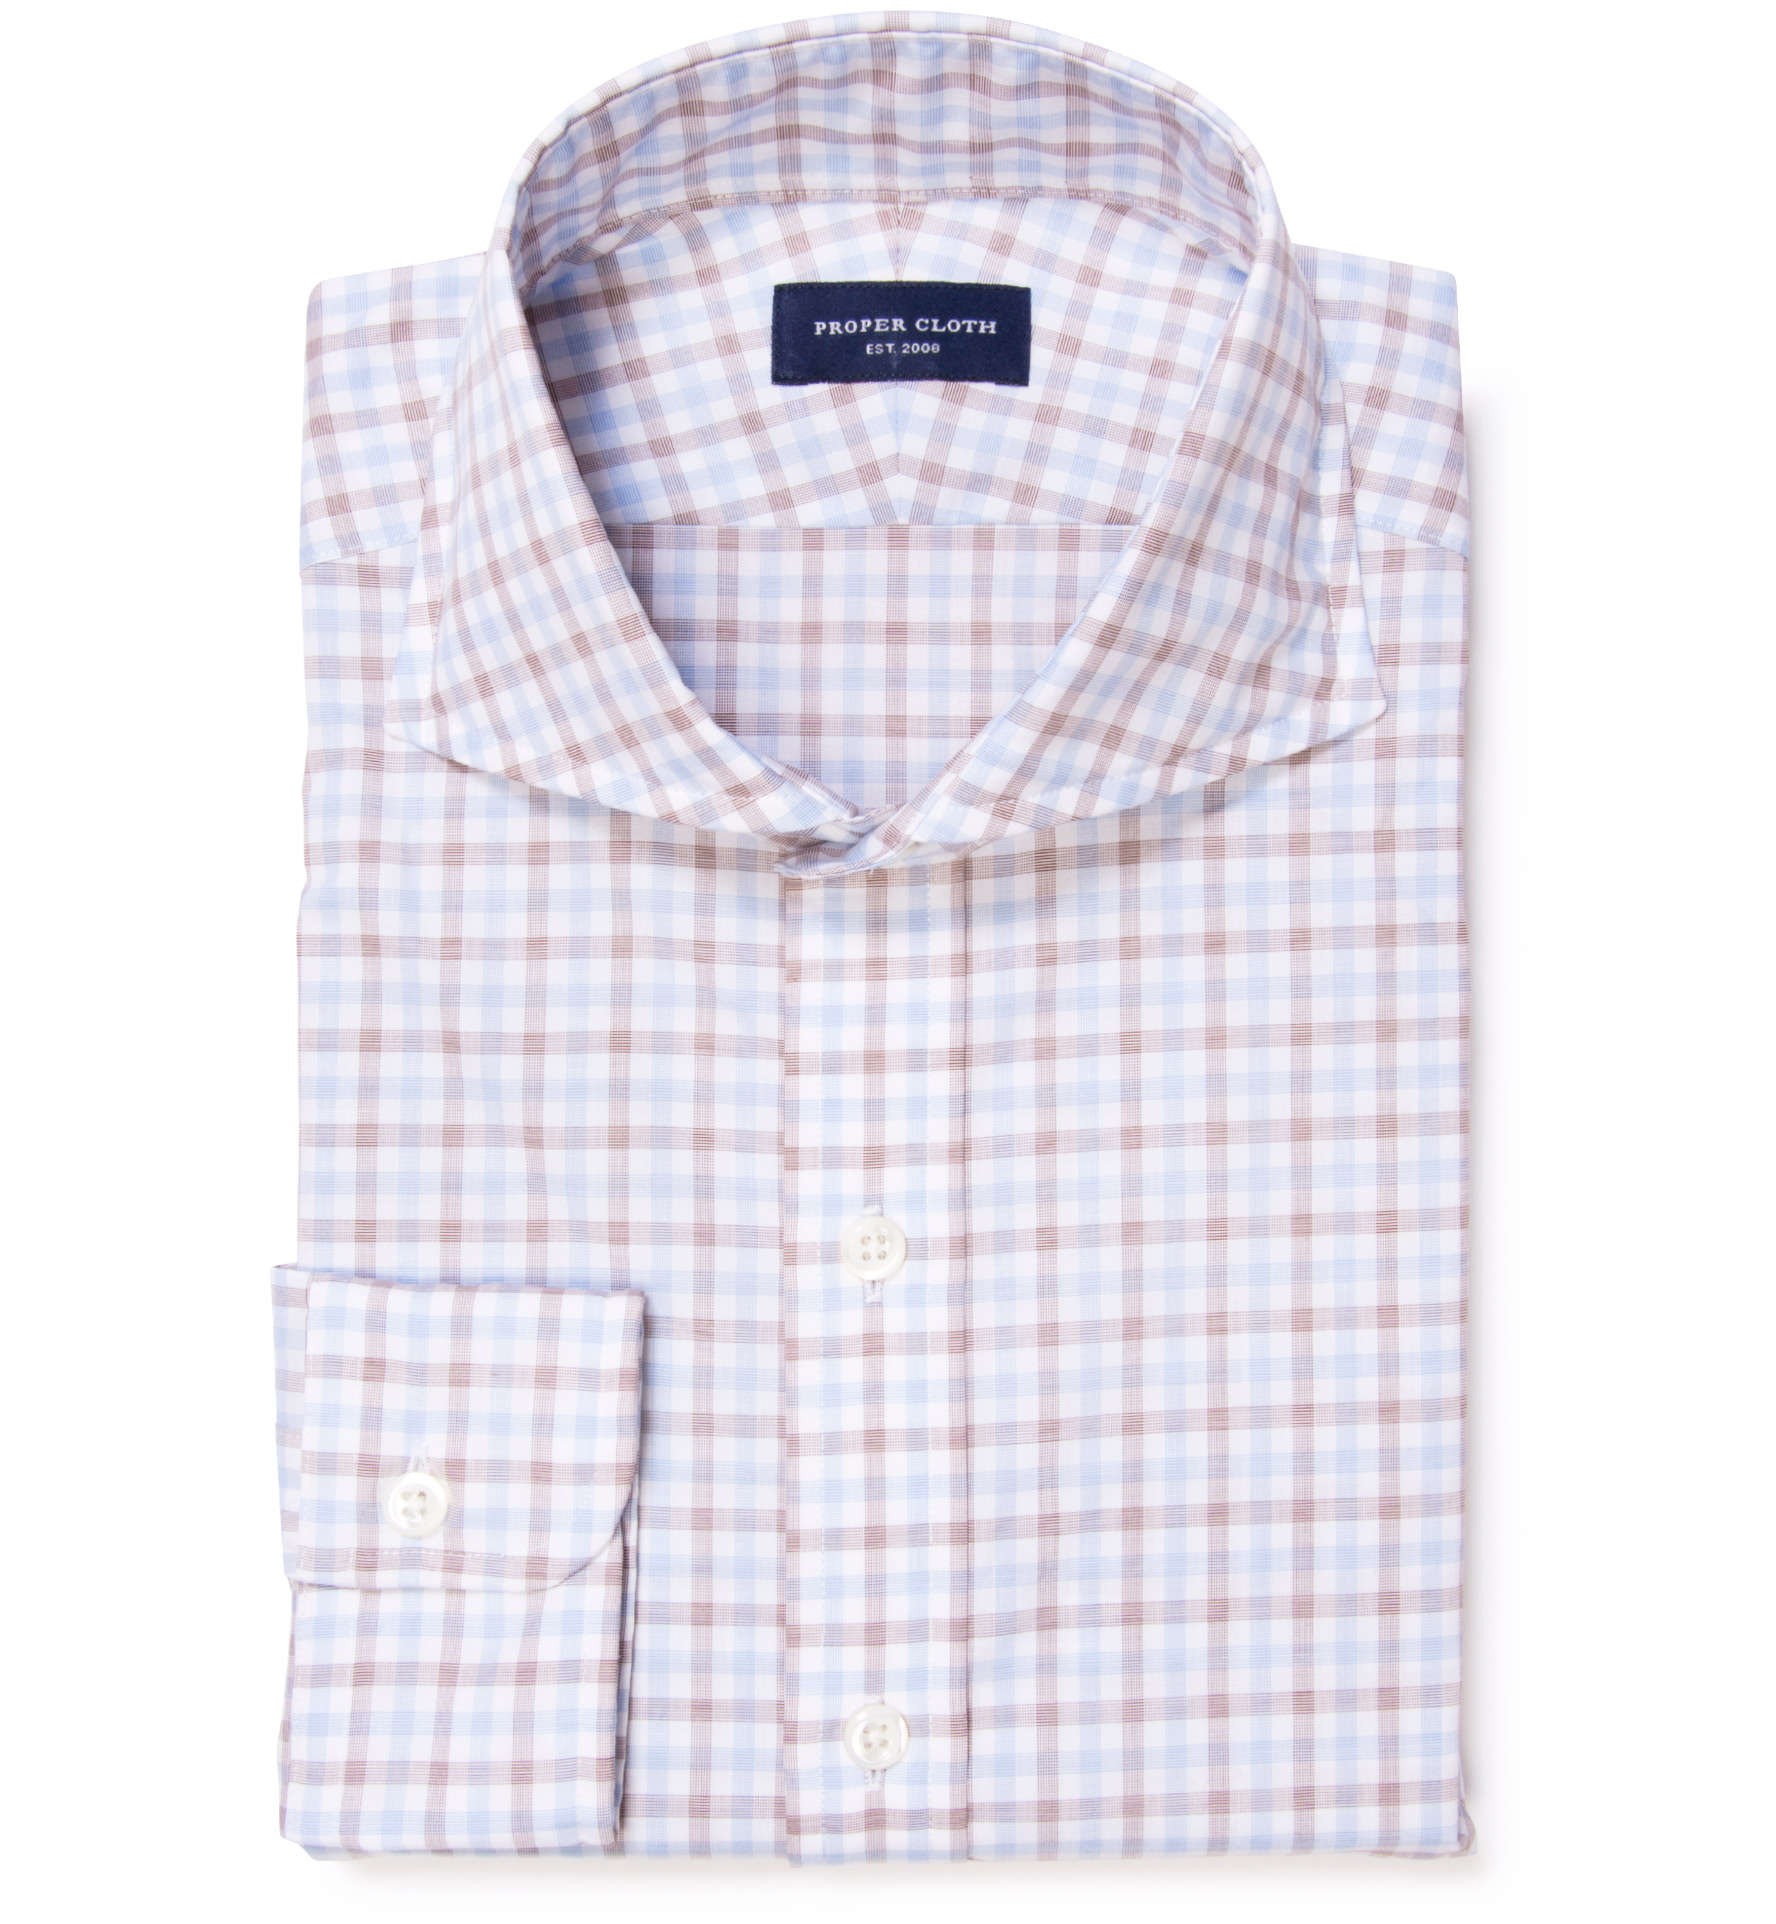 Thomas mason brown multi check dress shirt by proper cloth for Thomas mason dress shirts